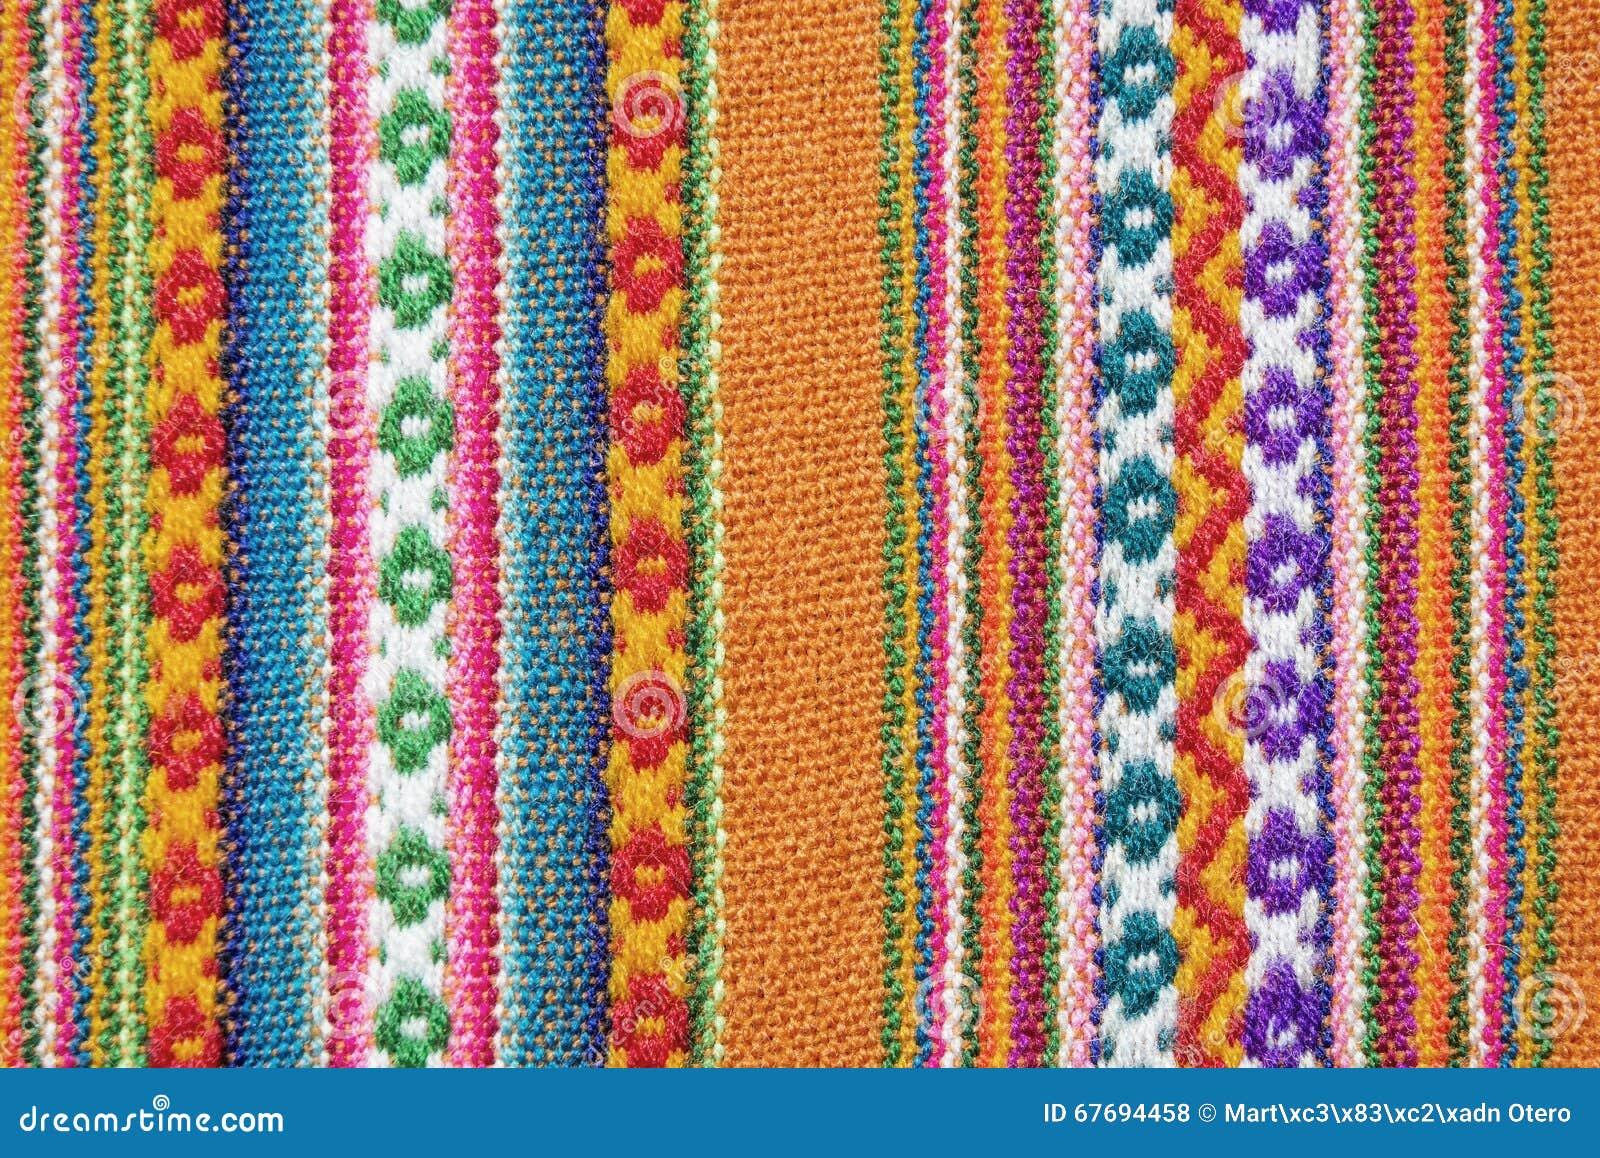 Natural Colored Wool Yarn